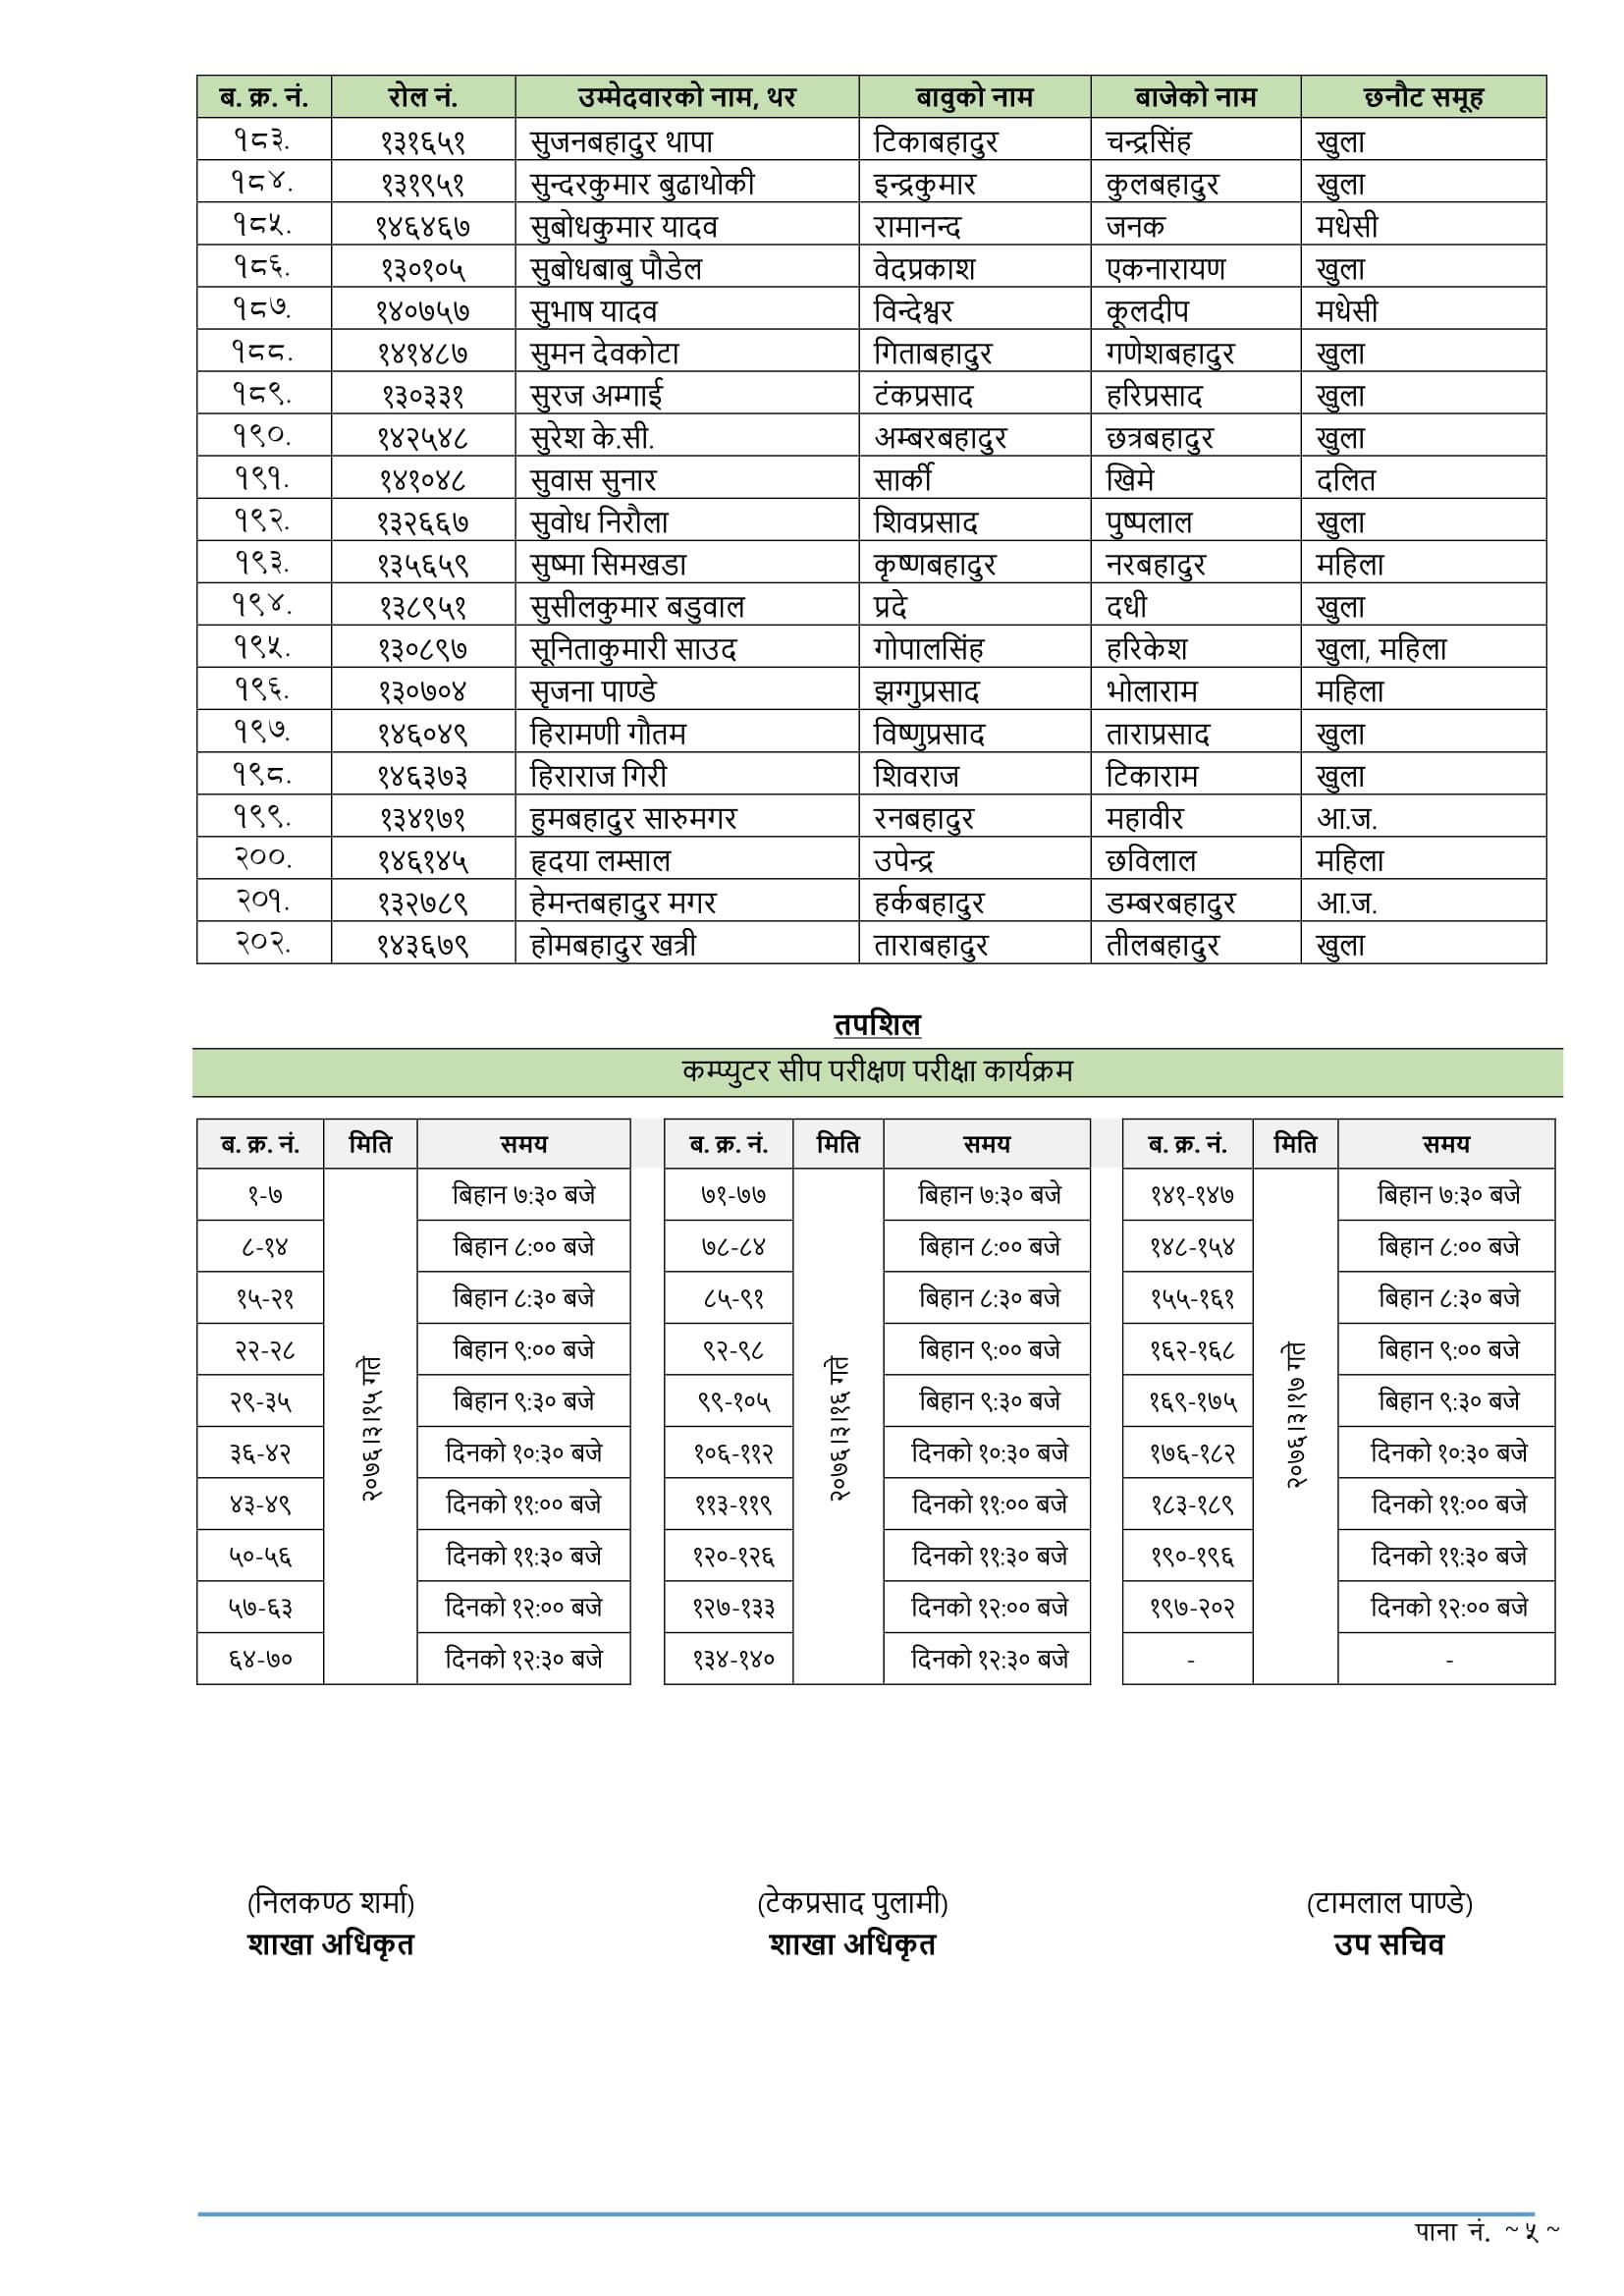 Lok Sewa Aayog Exam Results, Lok Sewa Aayog Exam Results 2076, Lok Sewa Aayog Exam Results 2075, Lok Sewa Aayog Exam Results kathmanu, Lok Sewa Aayog Exam Results khotang, Lok Sewa Aayog Nasu Result, Lok Sewa Aayog Nasu Result 2076, lok sewa natija, lok sewa aayog result 2075, loksewa result 2075, lok sewa aayog, www.psc.gov.np result 2075, lok sewa nasu natija, lok sewa aayog nasu result 2075, loksewa nasu result 2075, lok sewa aayog, www.psc.gov.np nasu result 2075, www.psc.gov.np nasu result, psc.gov.np nasu result, nasu results, nayab subba results, psc result, psc results 2076, psc Nepal, nasu result 2076, nasu result list, नायब सुब्बा, लोक सेवा आयोग नतिजा , नायब सुब्बा नतिजा, ना.सु नतिजा